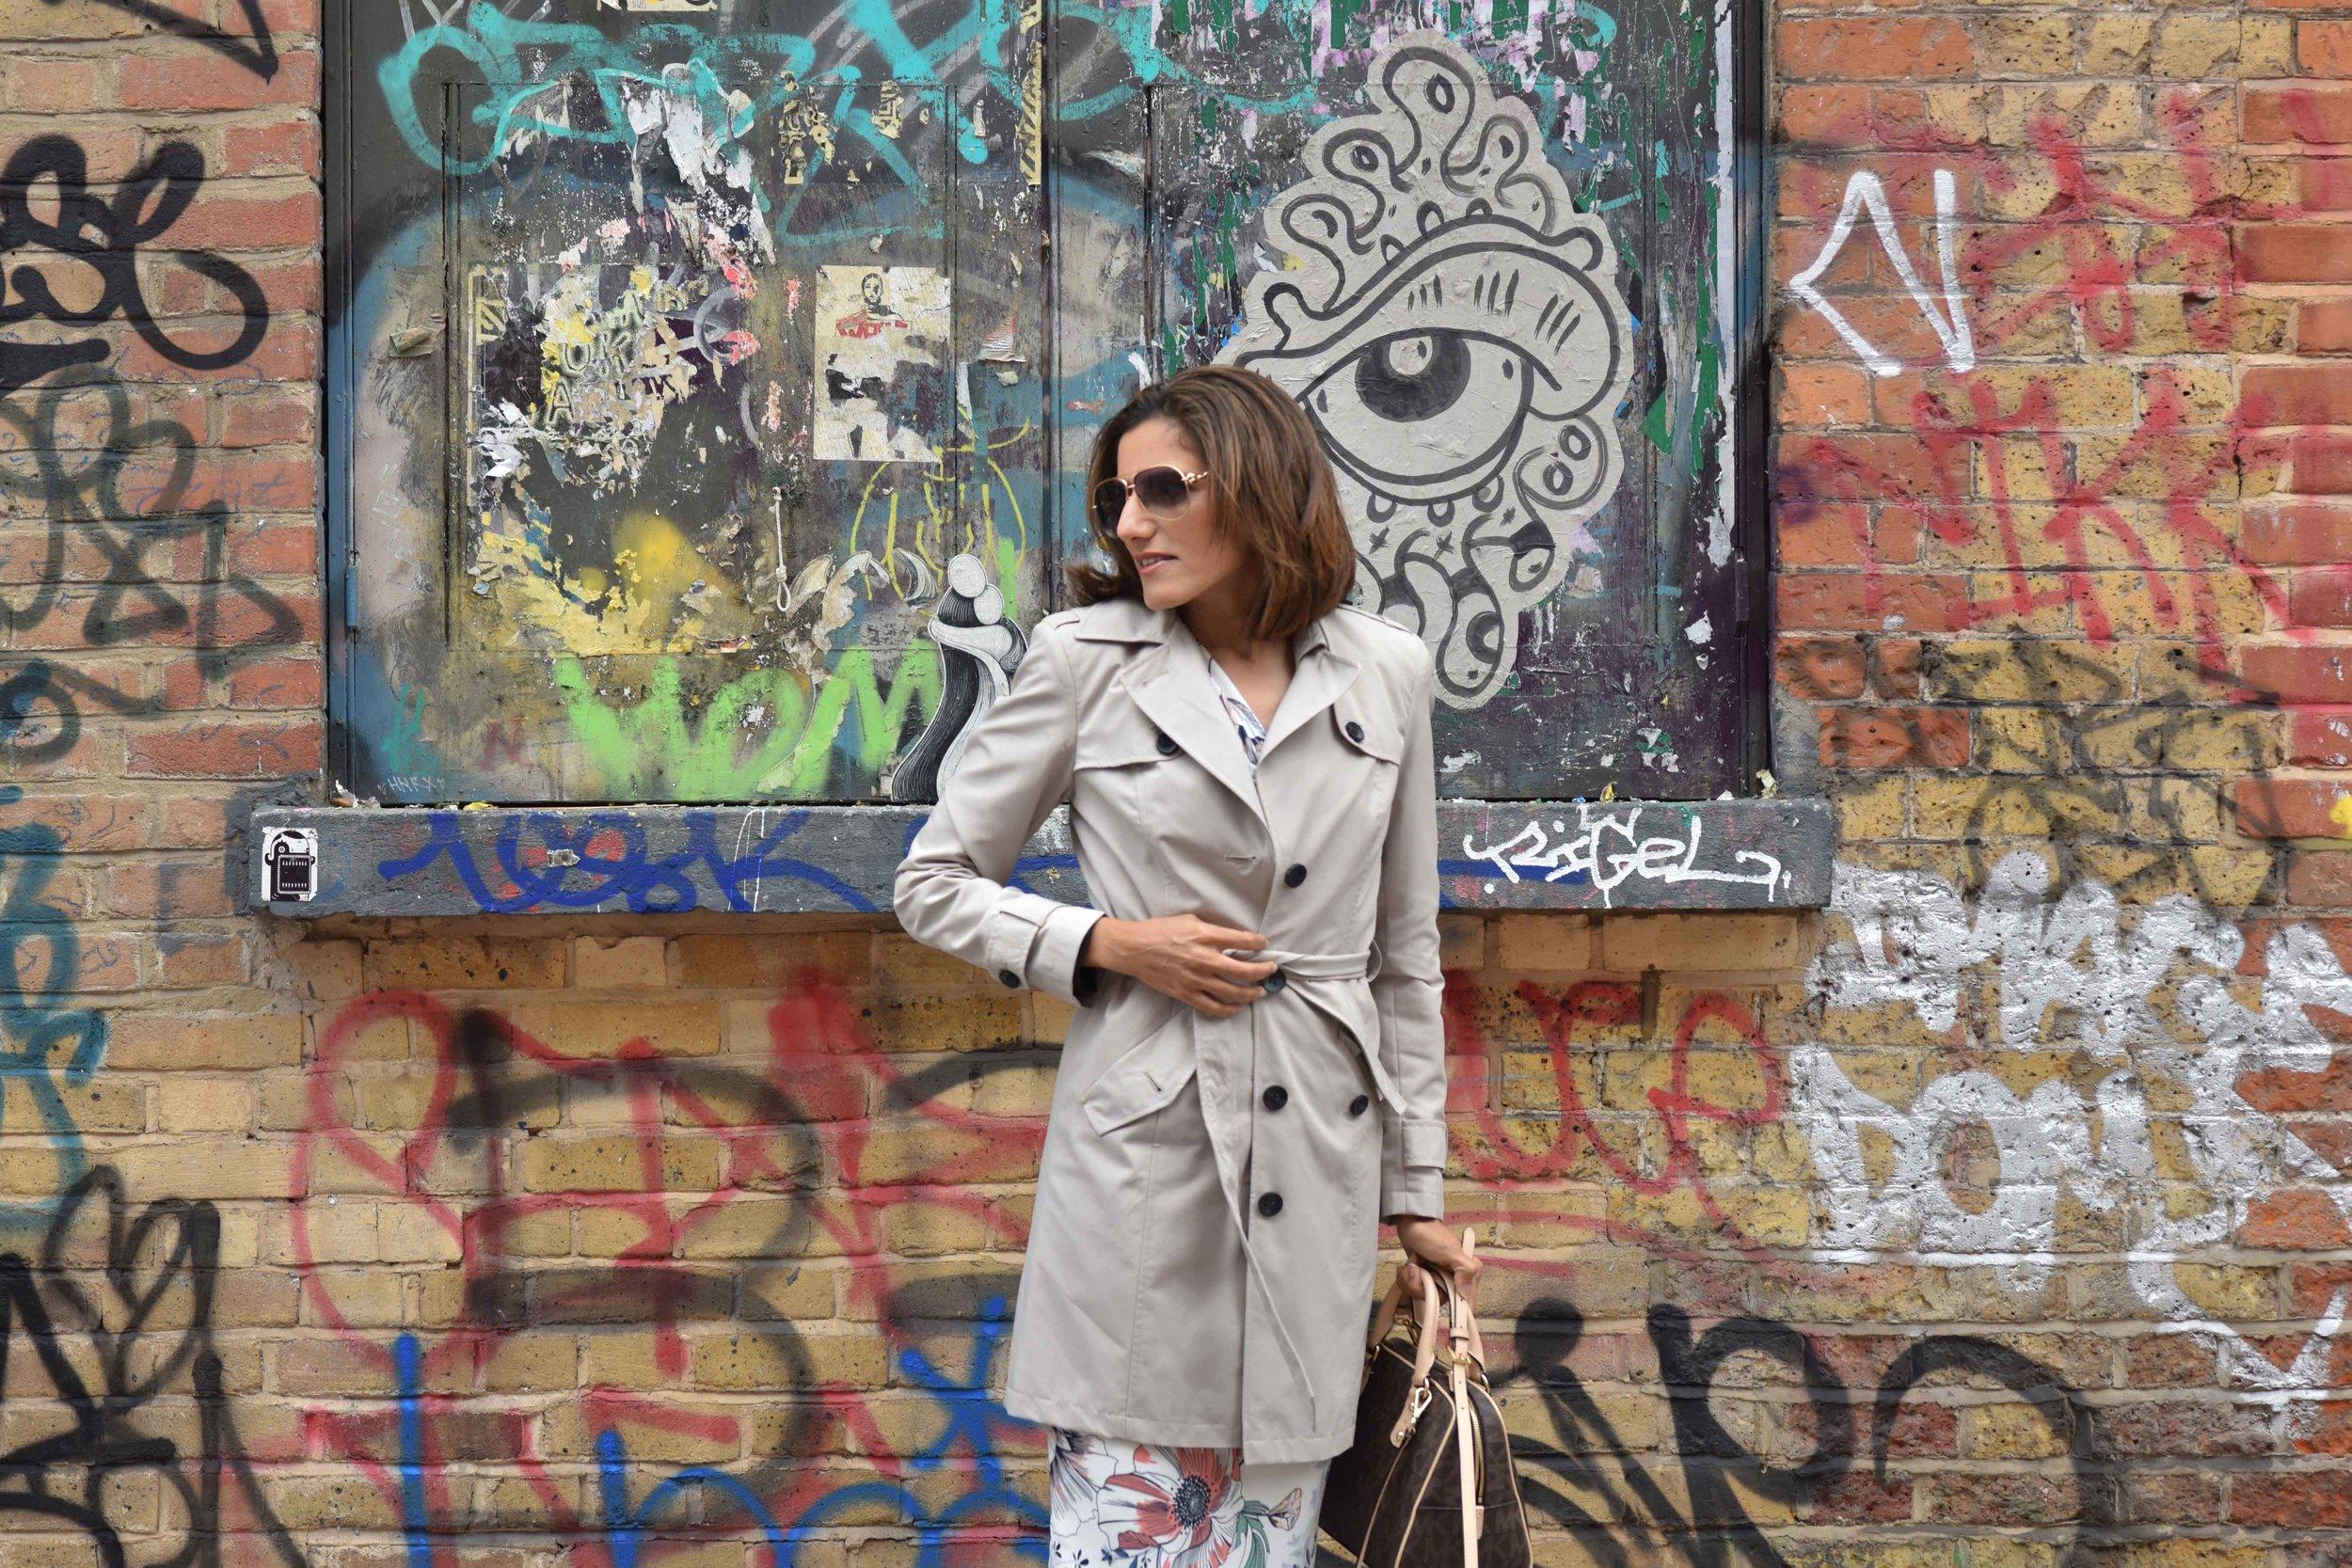 Marks and Spencer shift dress, Marks and Spencer trench, Gucci sunglasses, Michael Kors handbag, street fashion, street art, Shoreditch, London, U.K. Photo: Nina Shaw, Image©sourcingstyle.com